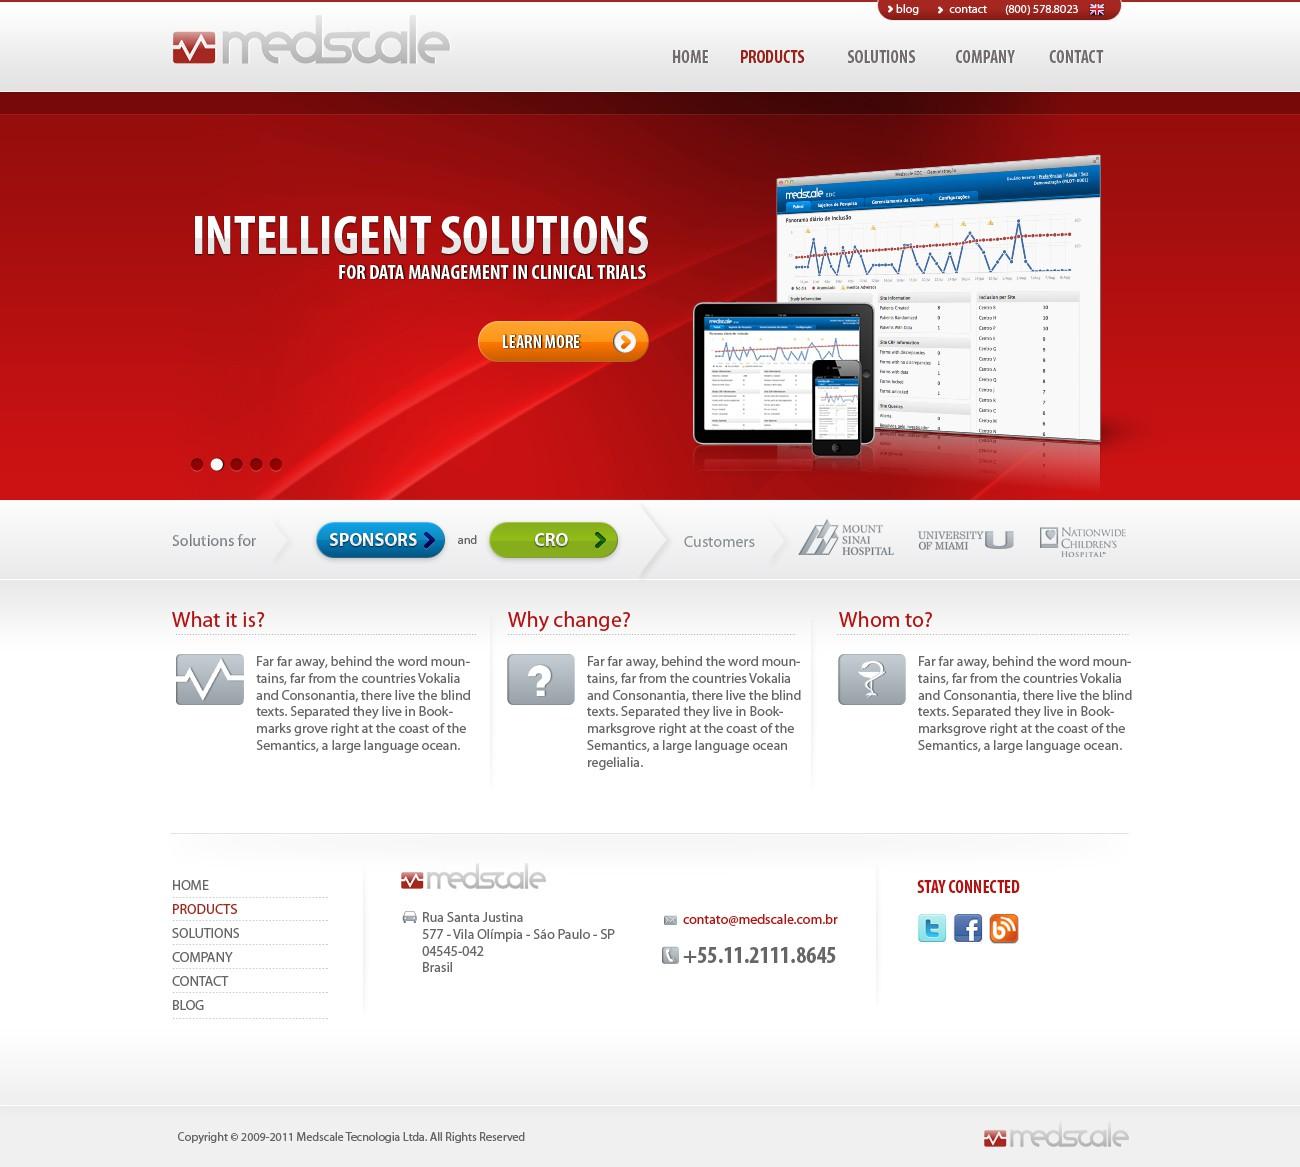 New website design for Medscale